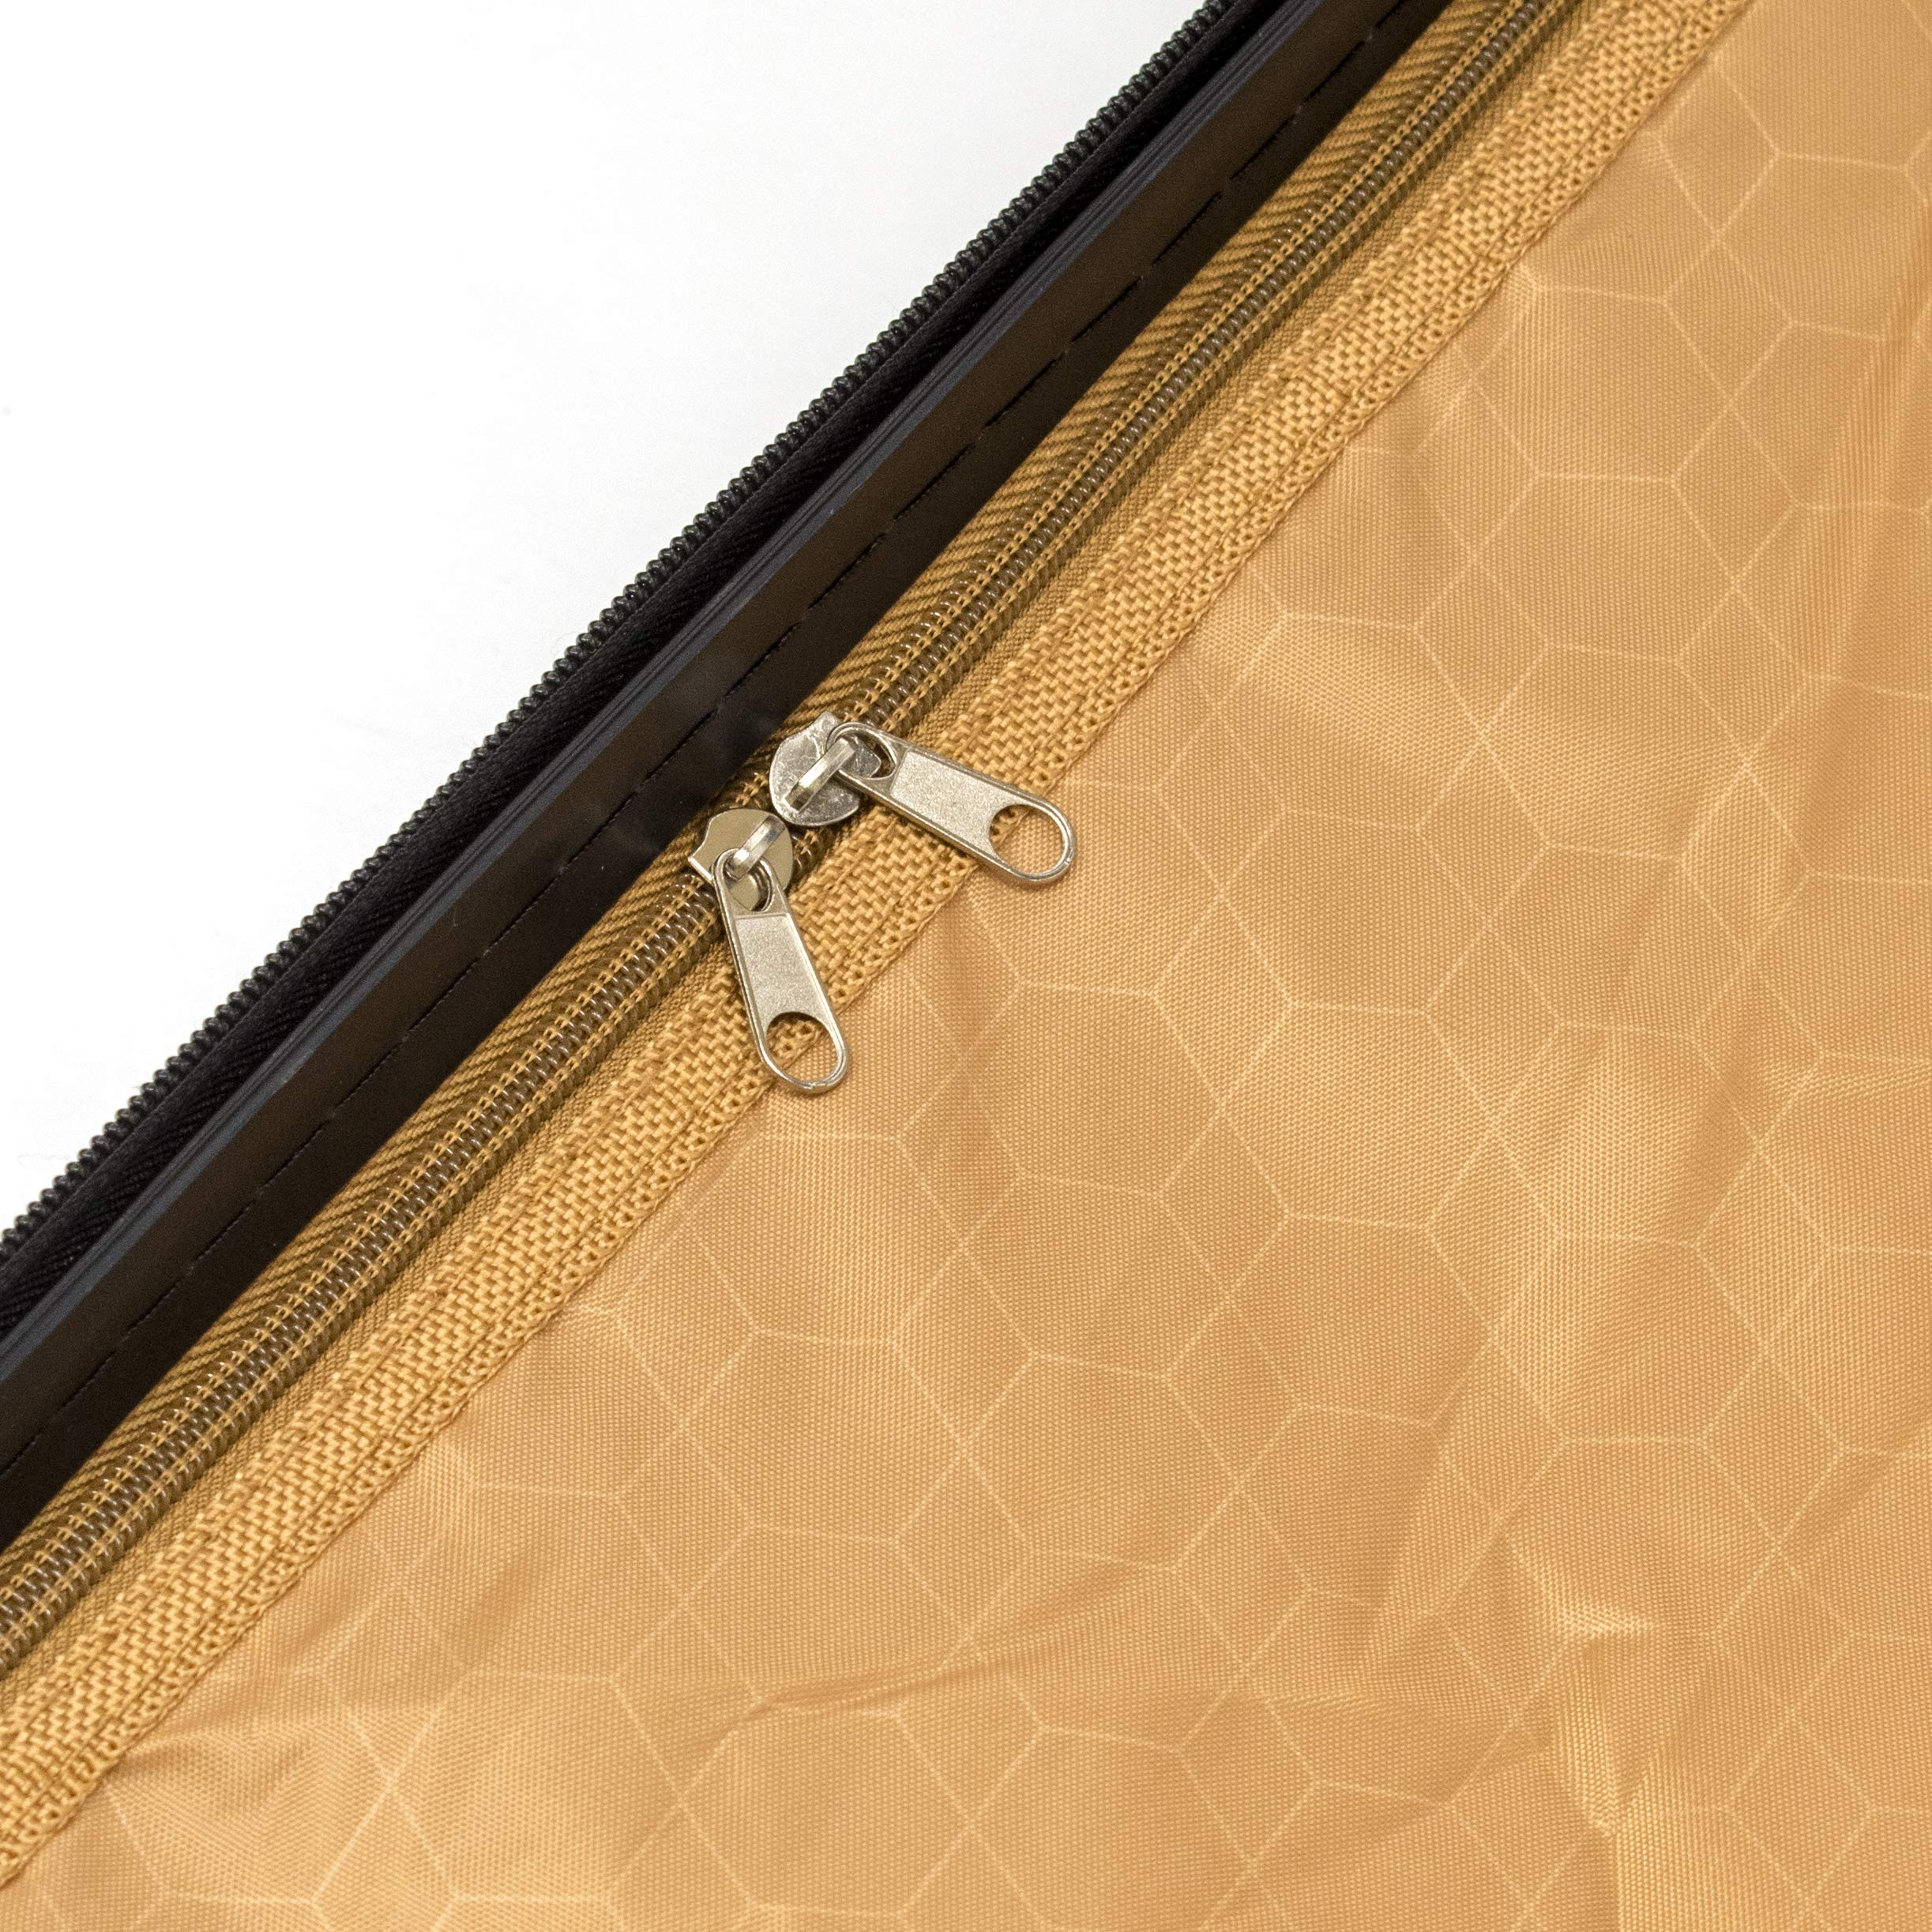 ALEKO LG915BURG ABS Luggage Travel Suitcase Set with Lock 3 Piece Horizontal Stripe Burgundy by ALEKO (Image #7)